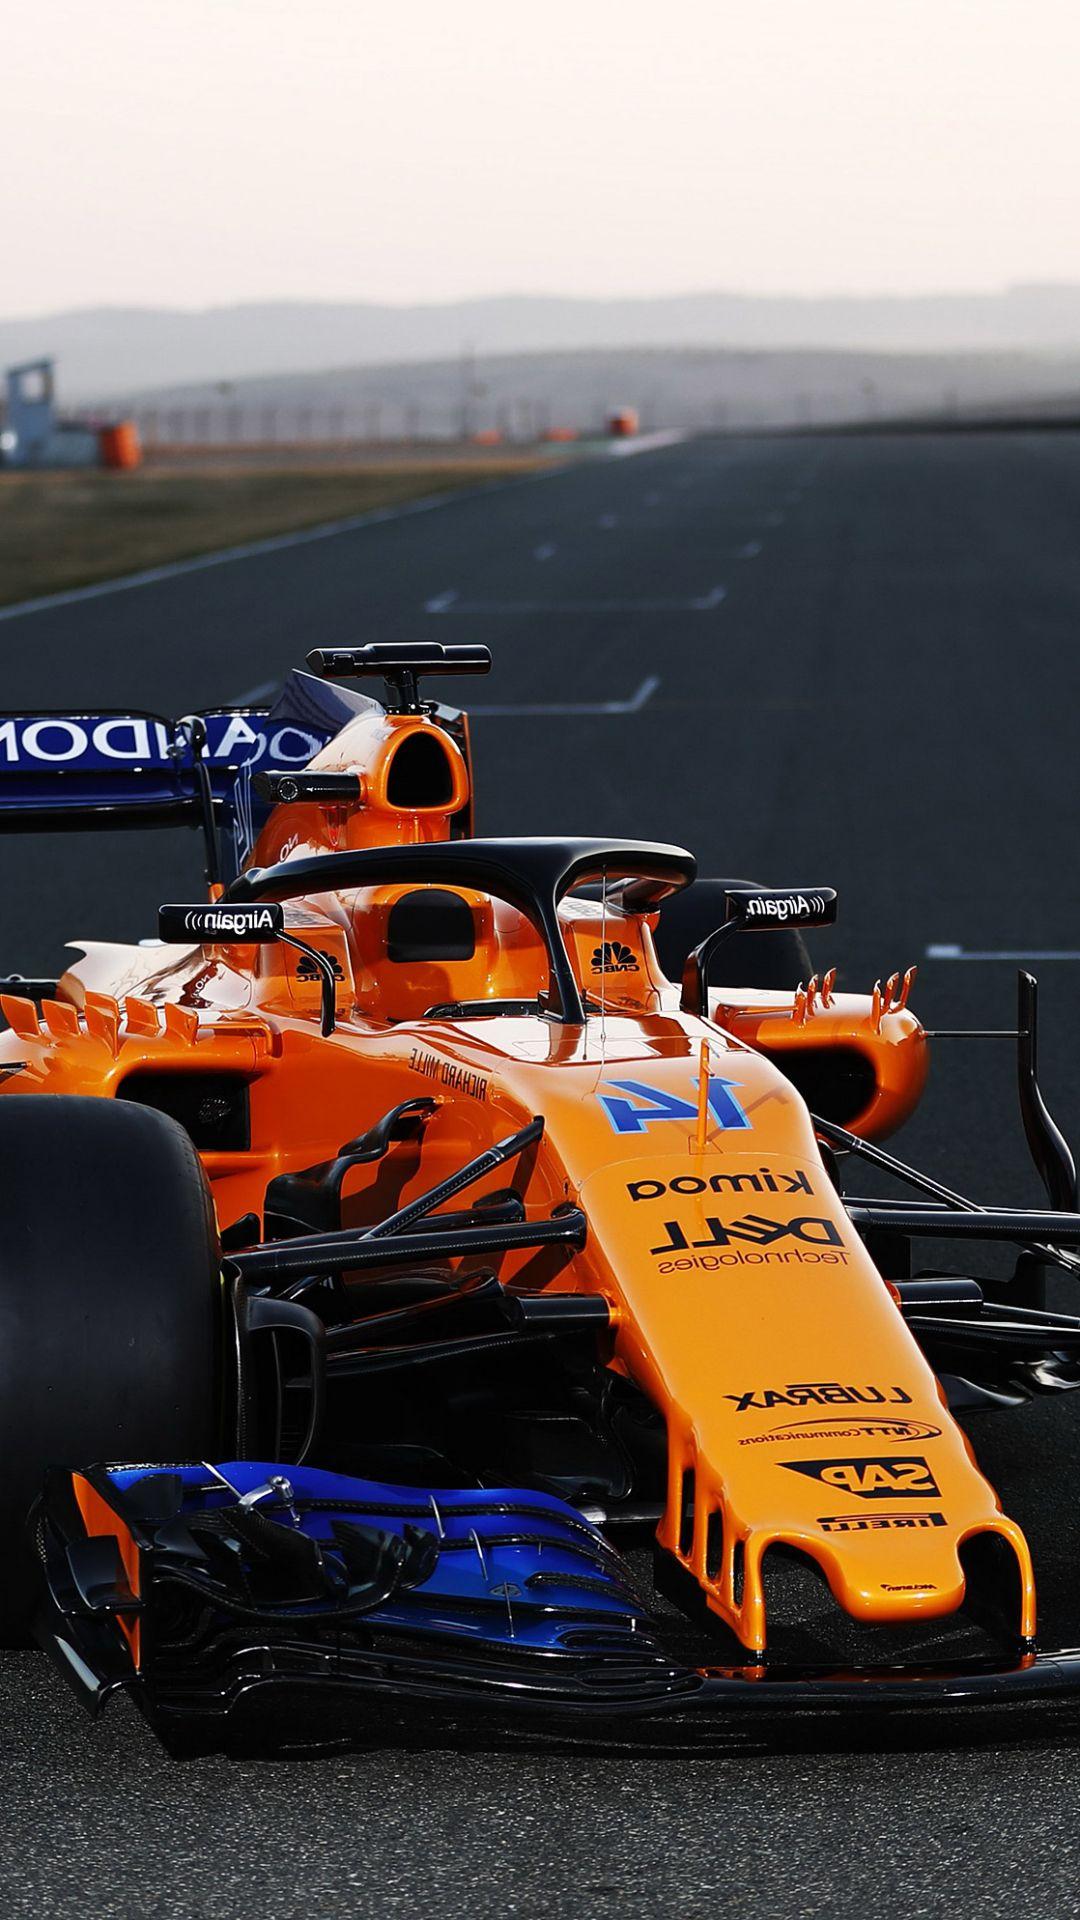 Sports F1 1080x1920 Mobile Wallpaper Mclaren Formula 1 Formula 1 Formula Racing